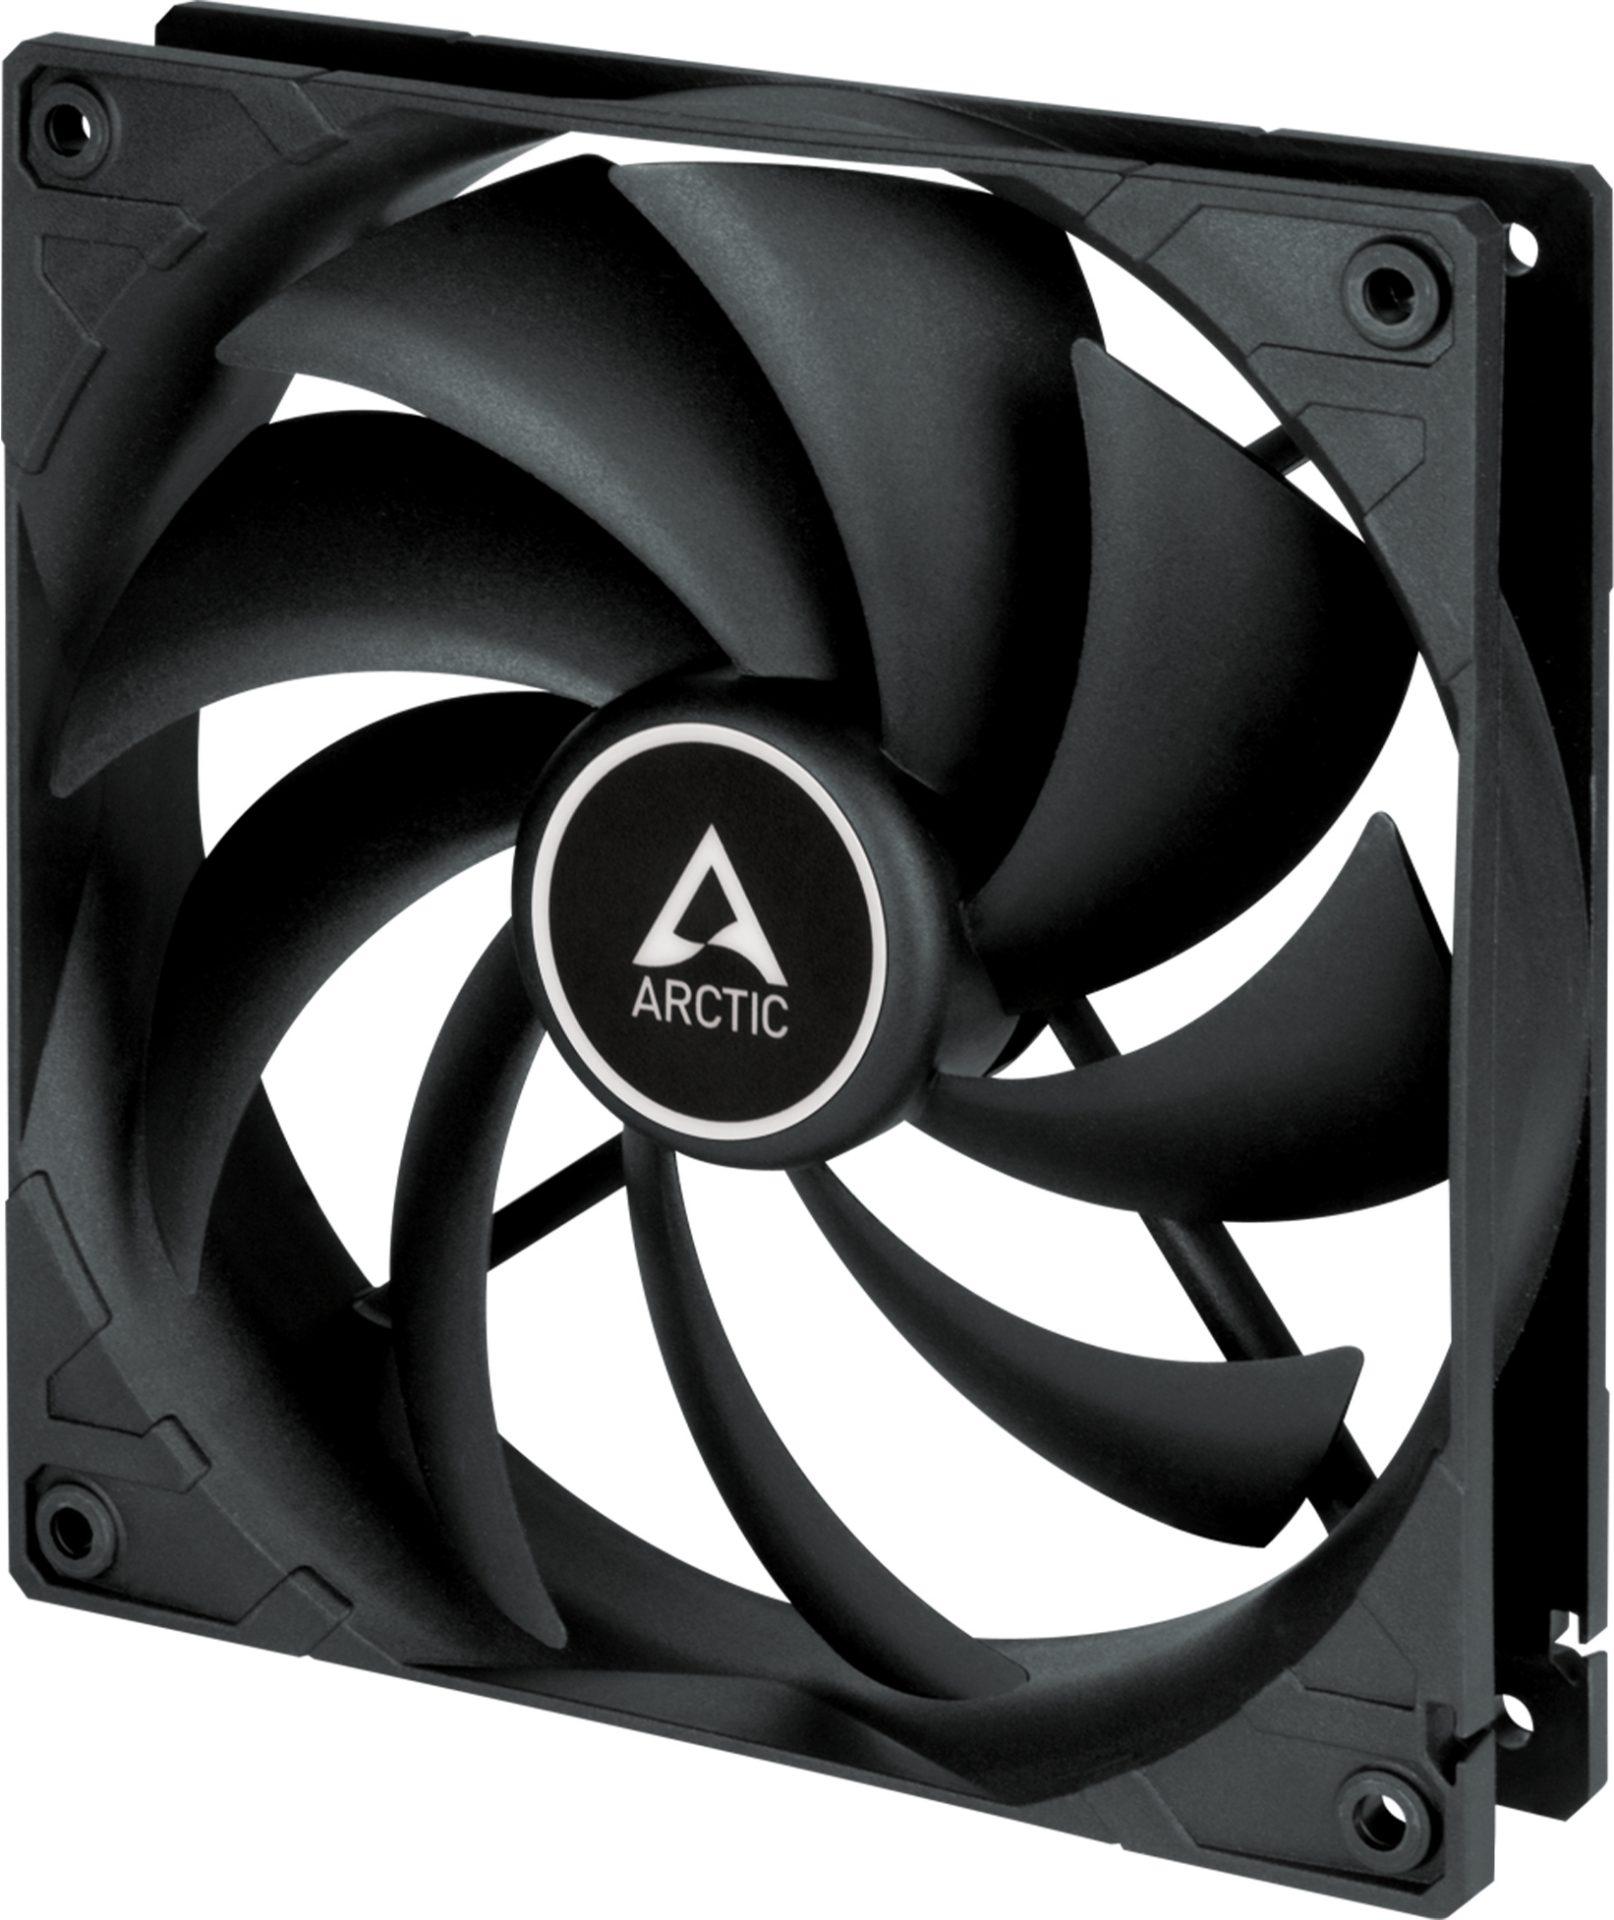 Arctic F14 Silent Case Fan - 140mm case fan with low speed - Black Color - Arctic 2.35.64.00.076